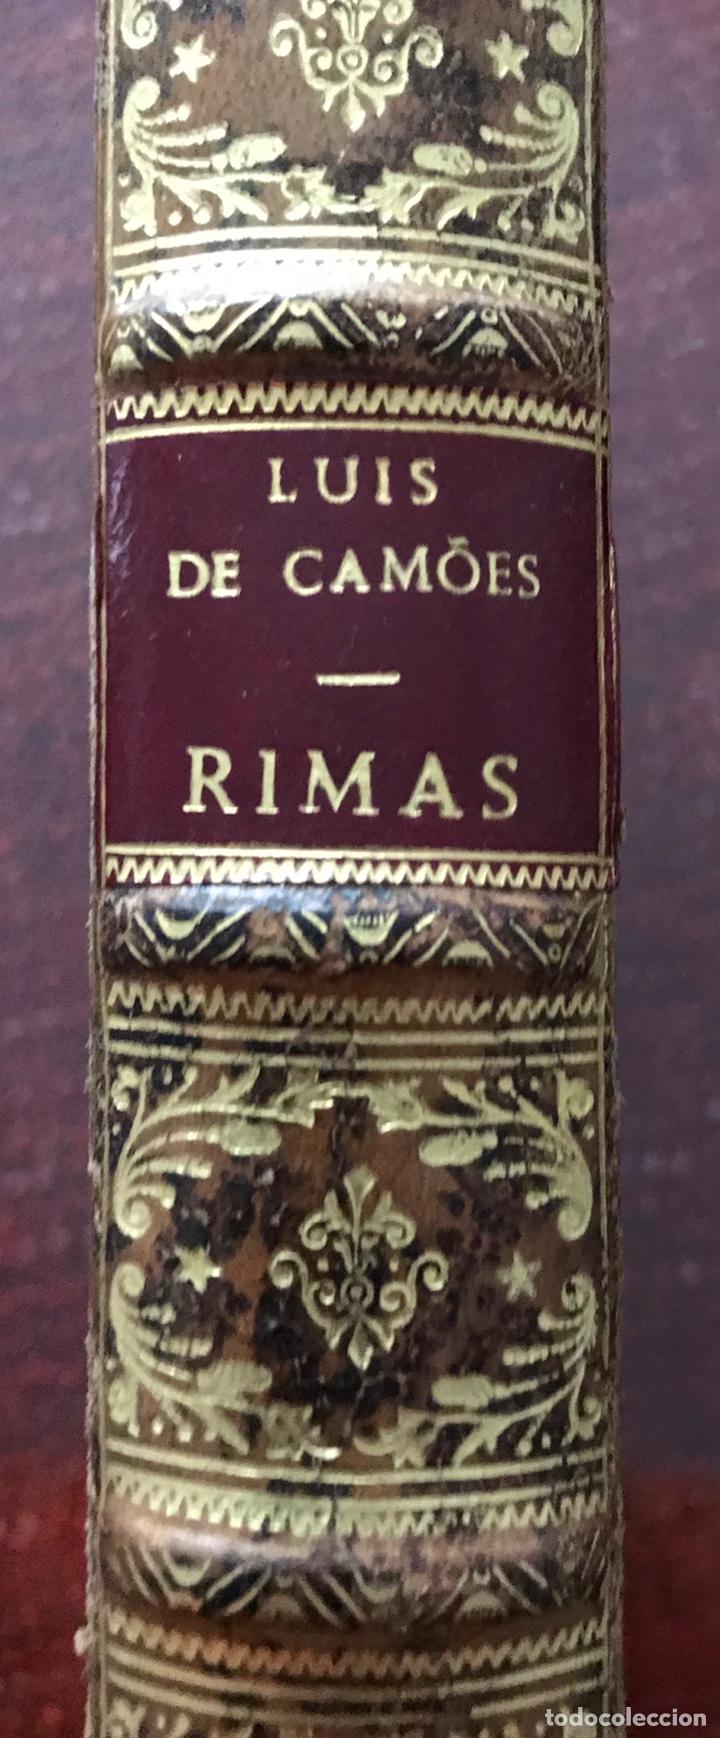 Libros antiguos: Rimas de Luis de Camões. 1598. Edición rarísima. - Foto 6 - 235418405